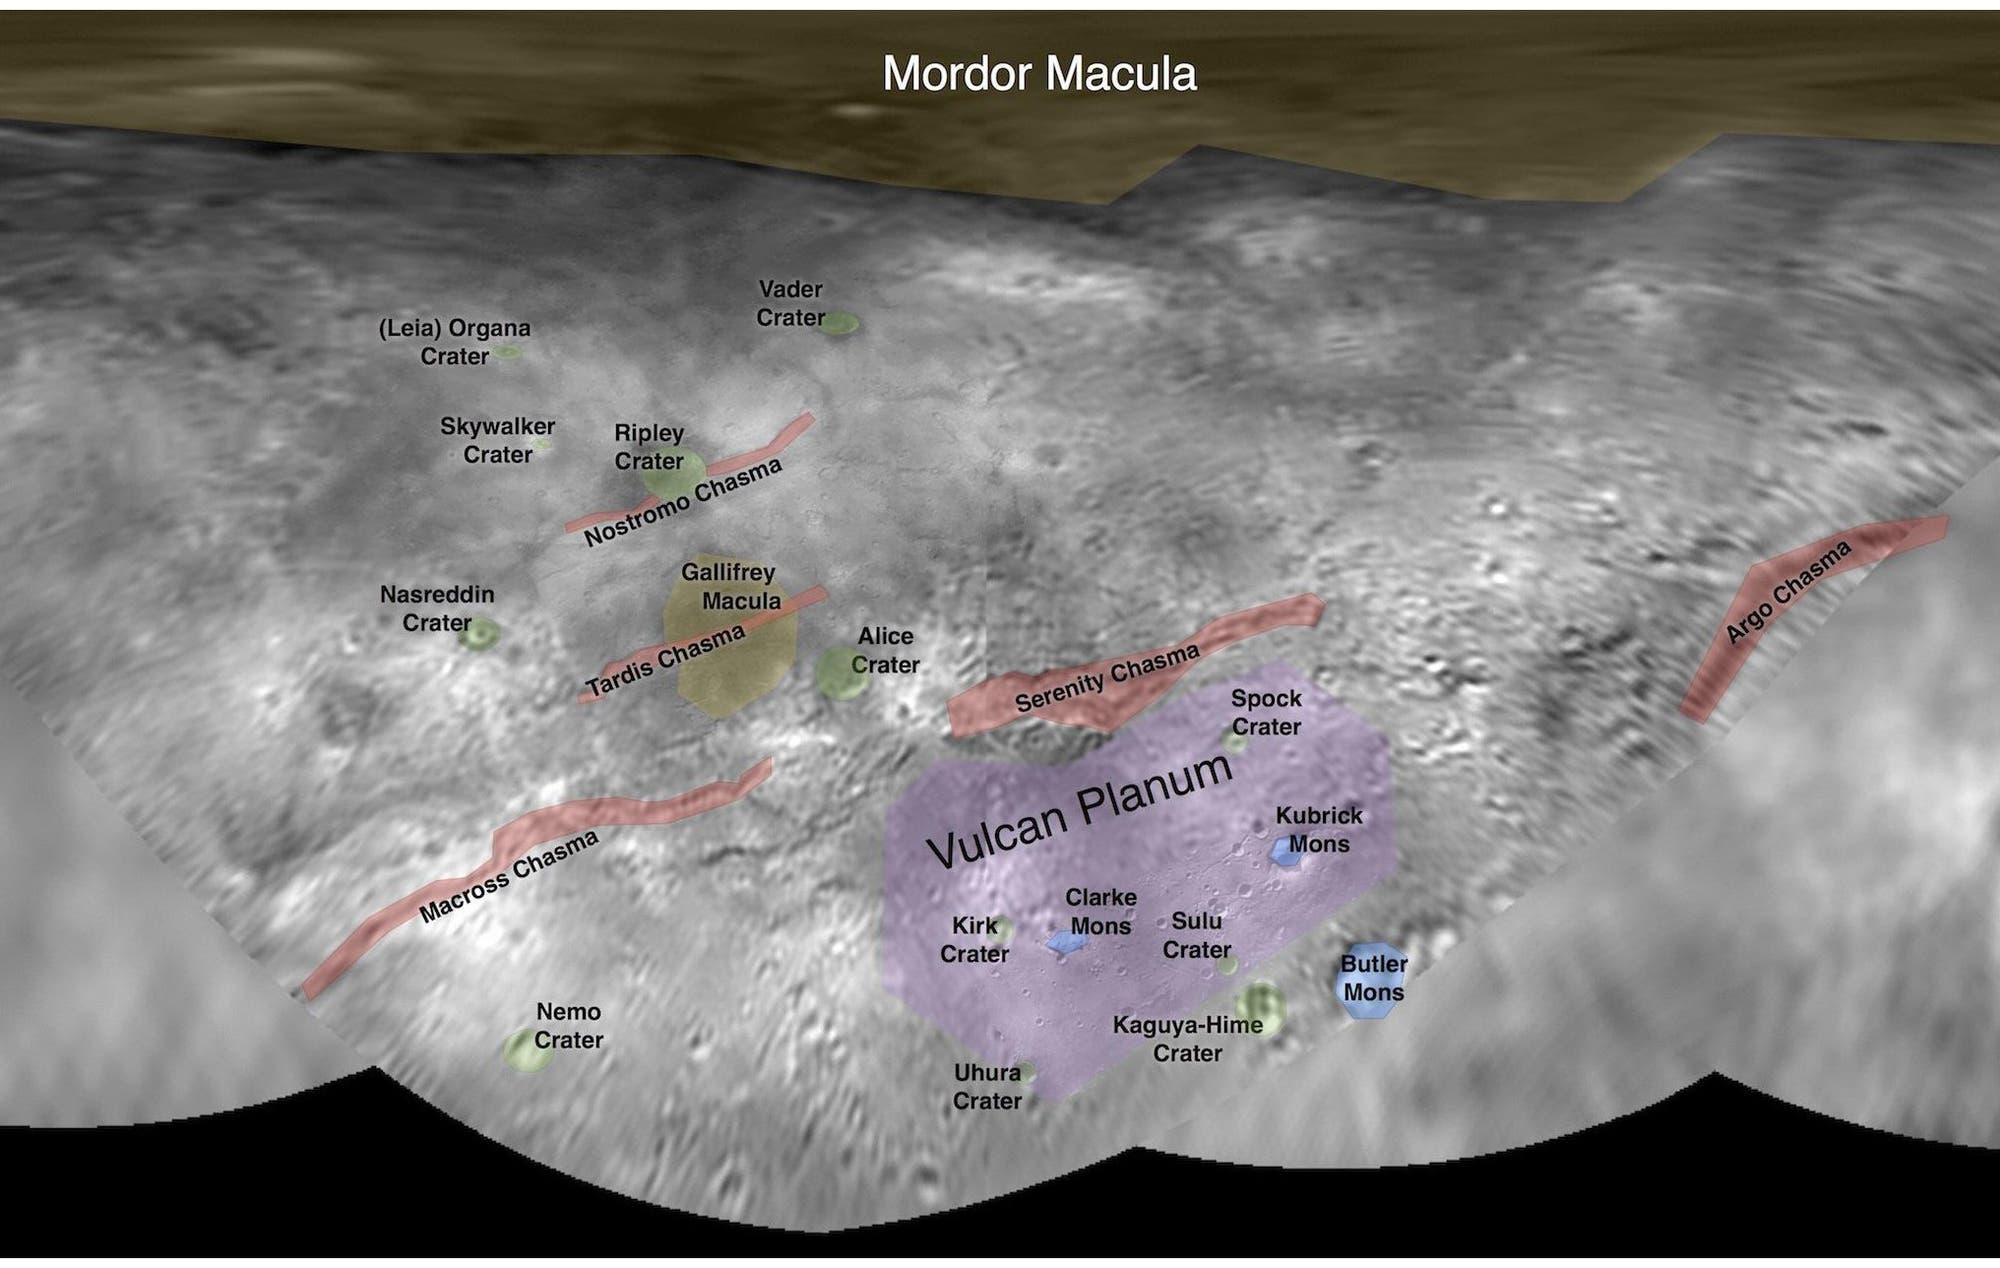 Charons benannte Strukturen